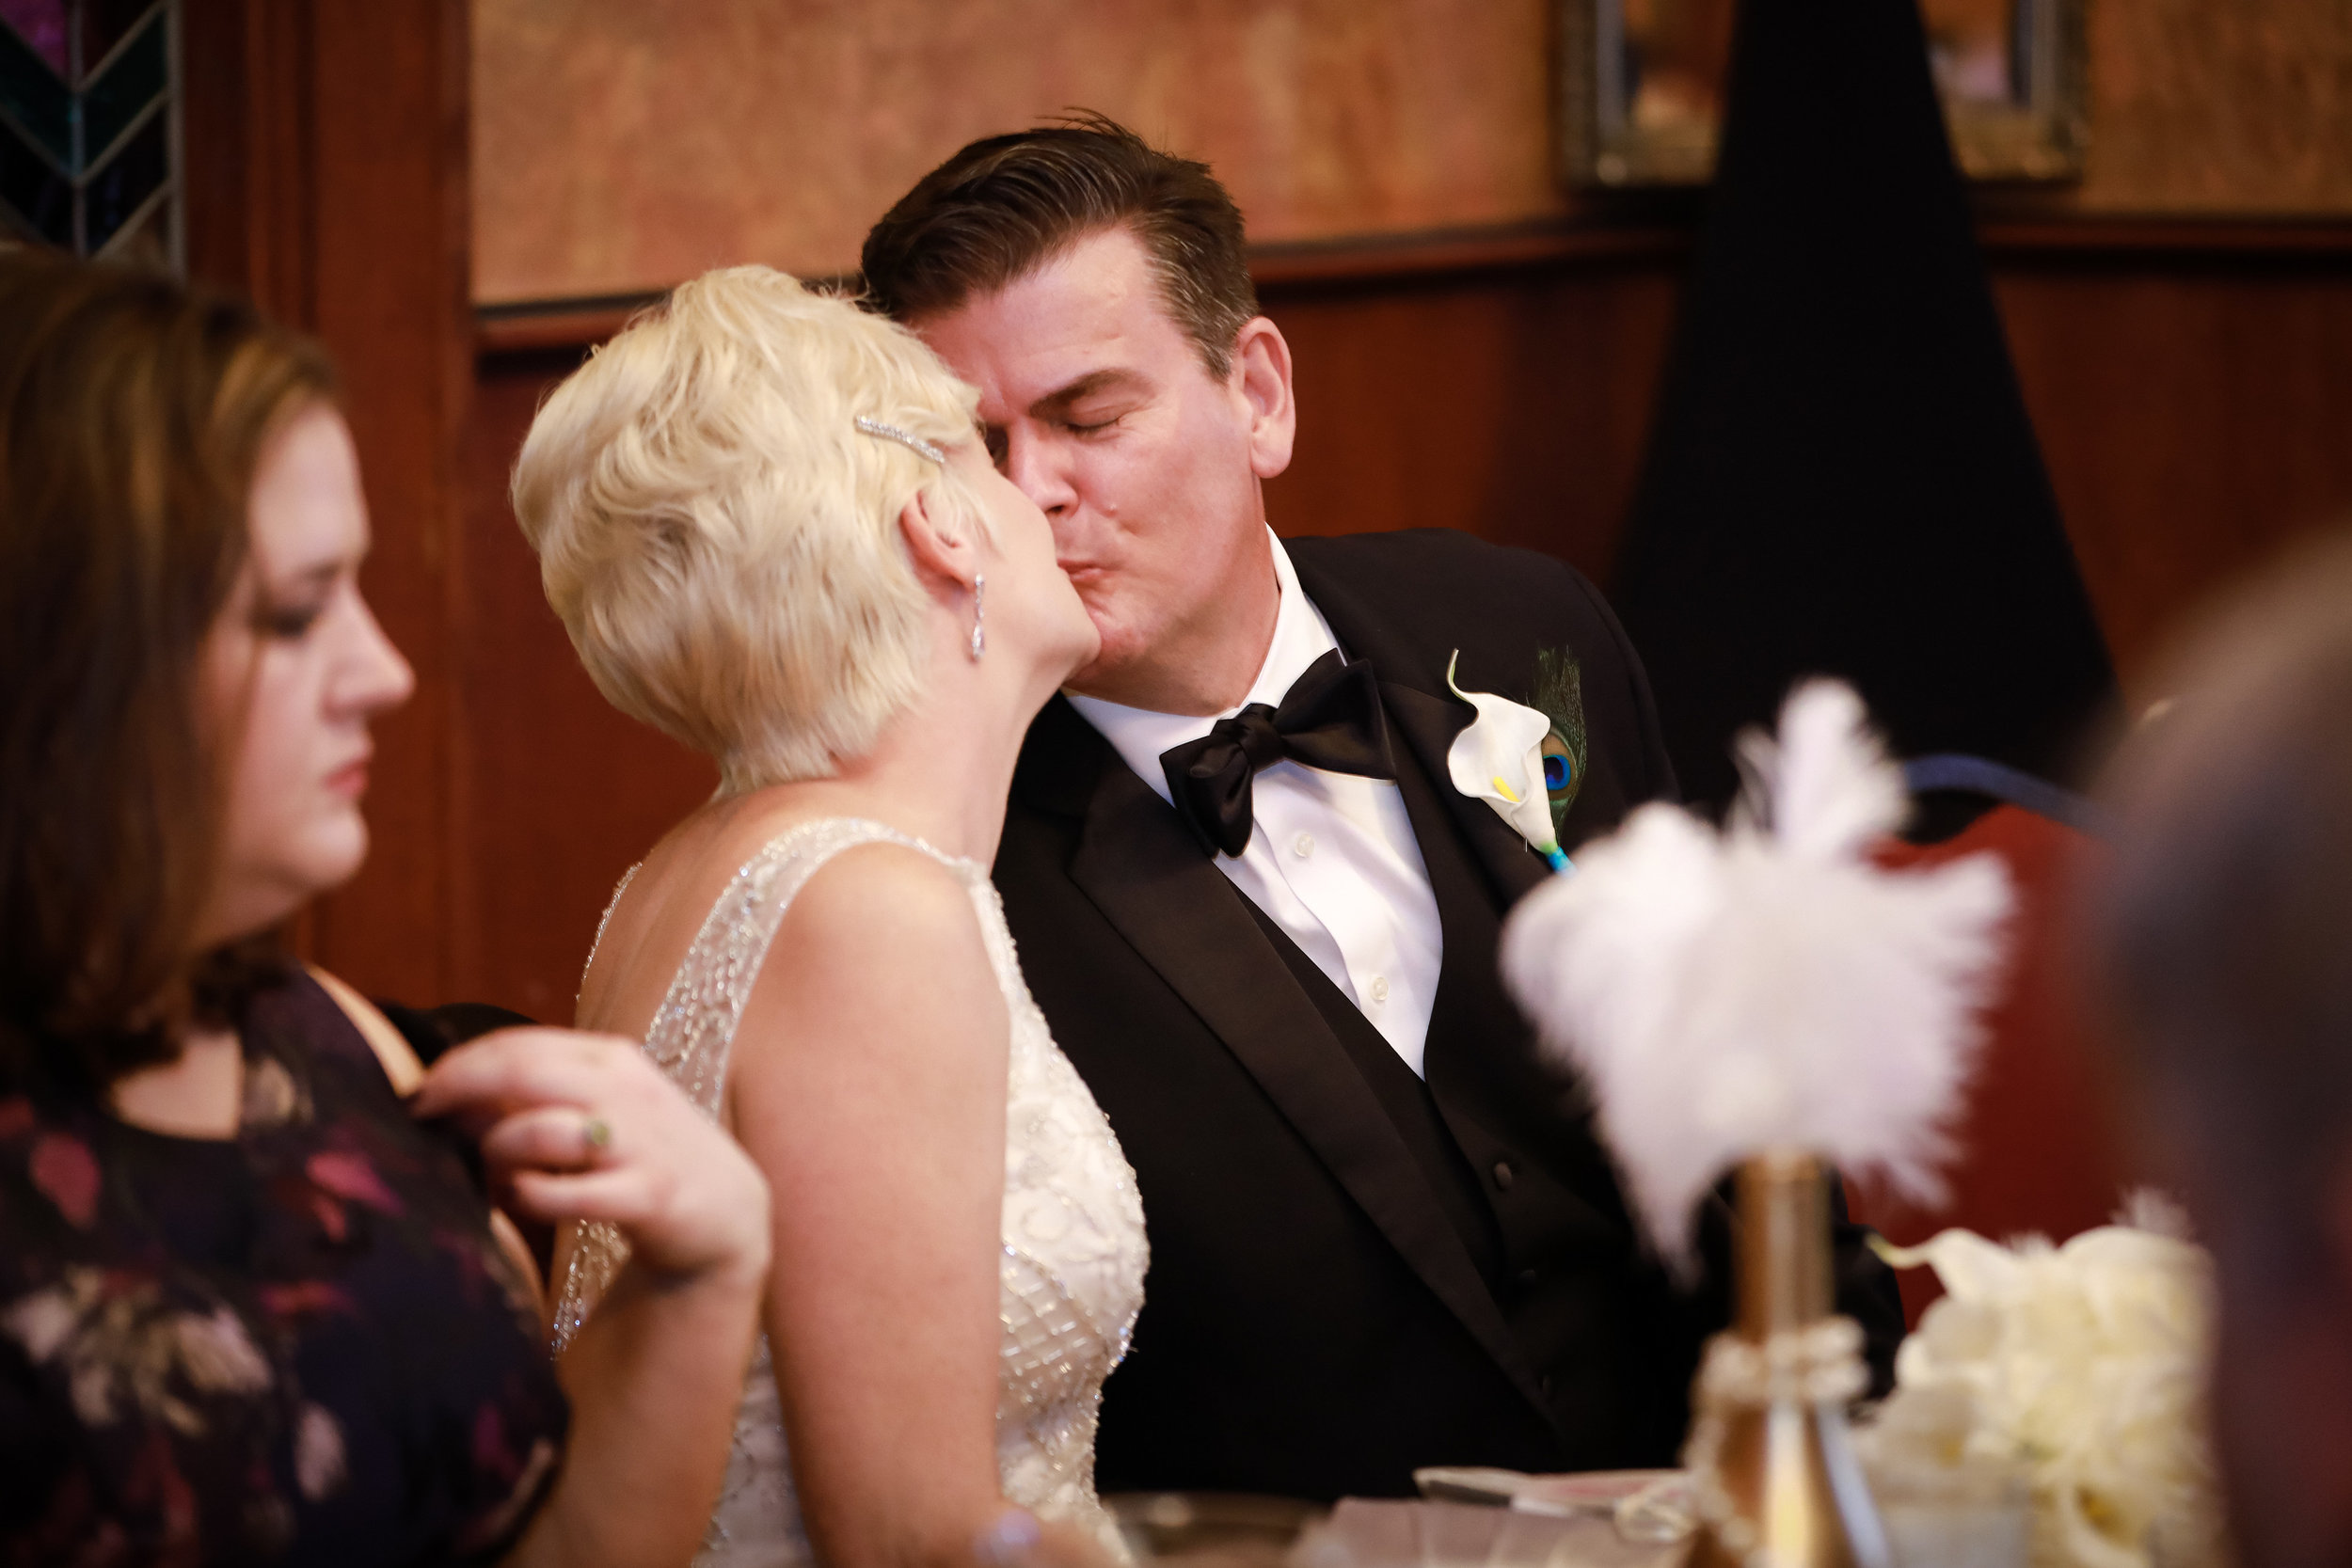 hannah_eric_wedding_day_catholic_church_and_la_traviata_restaurant_by_cassia_karin_photography_reception-52.jpg